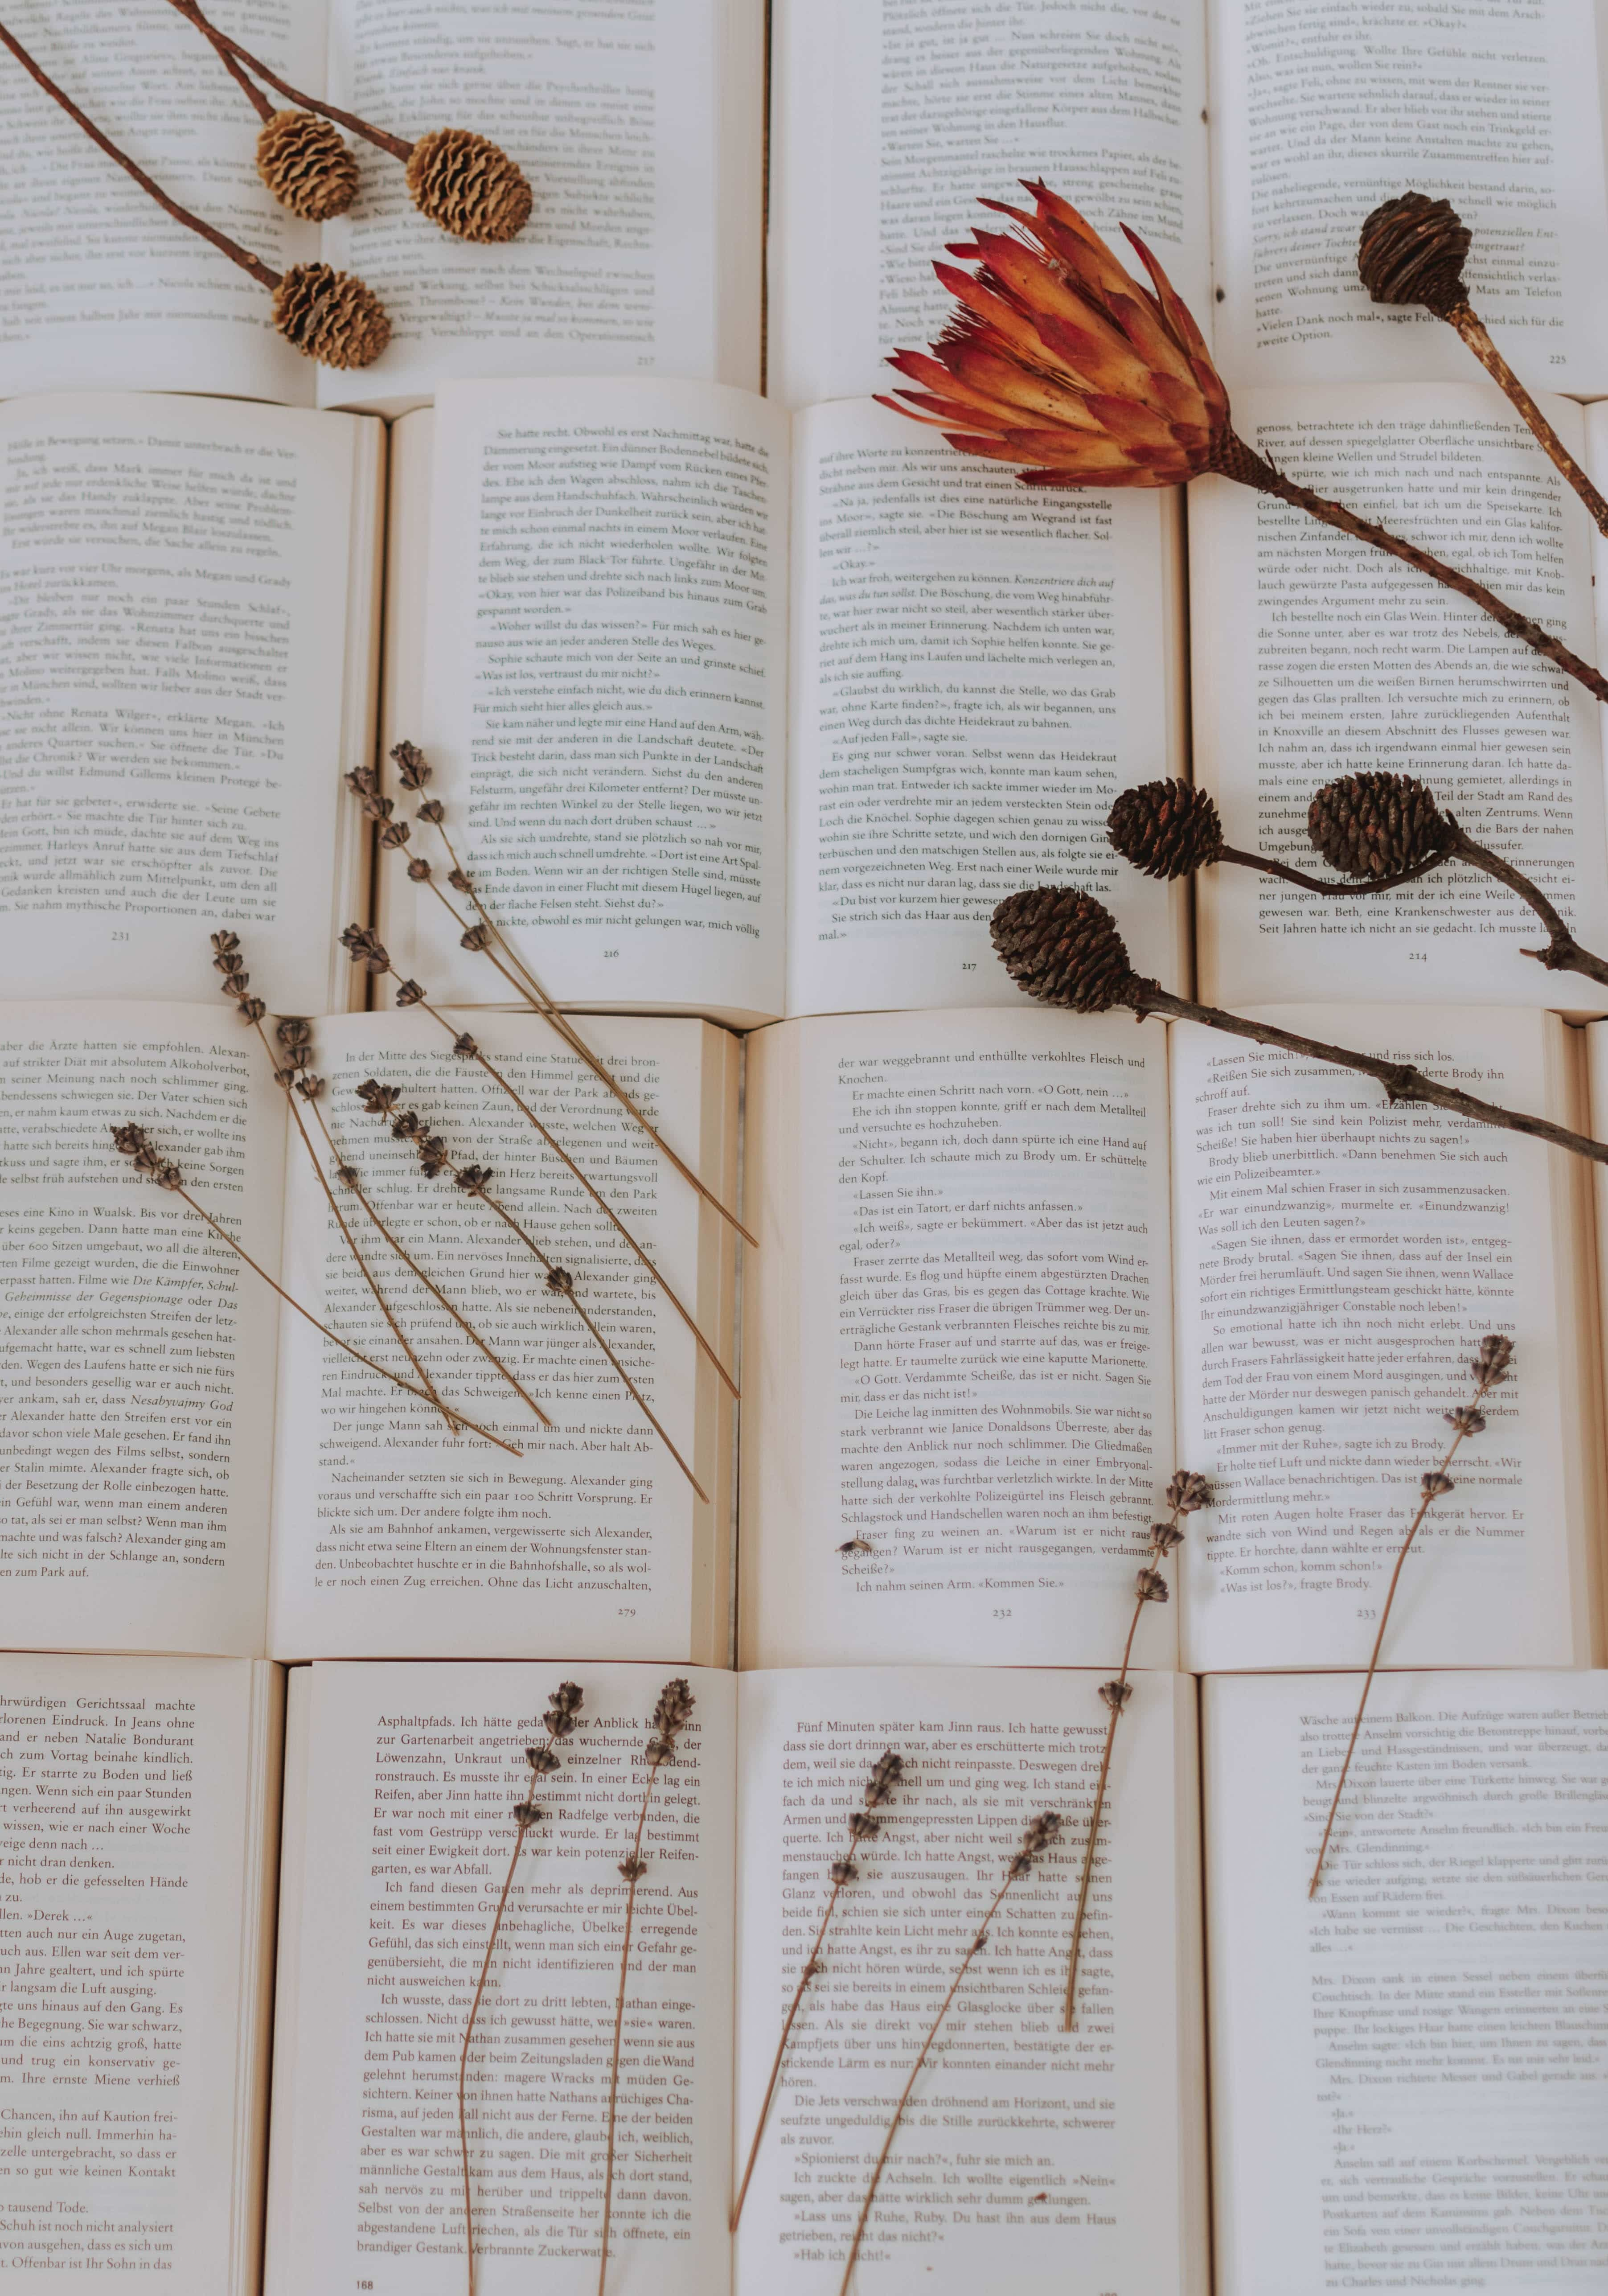 Love in Literature: Reading Love in Literature